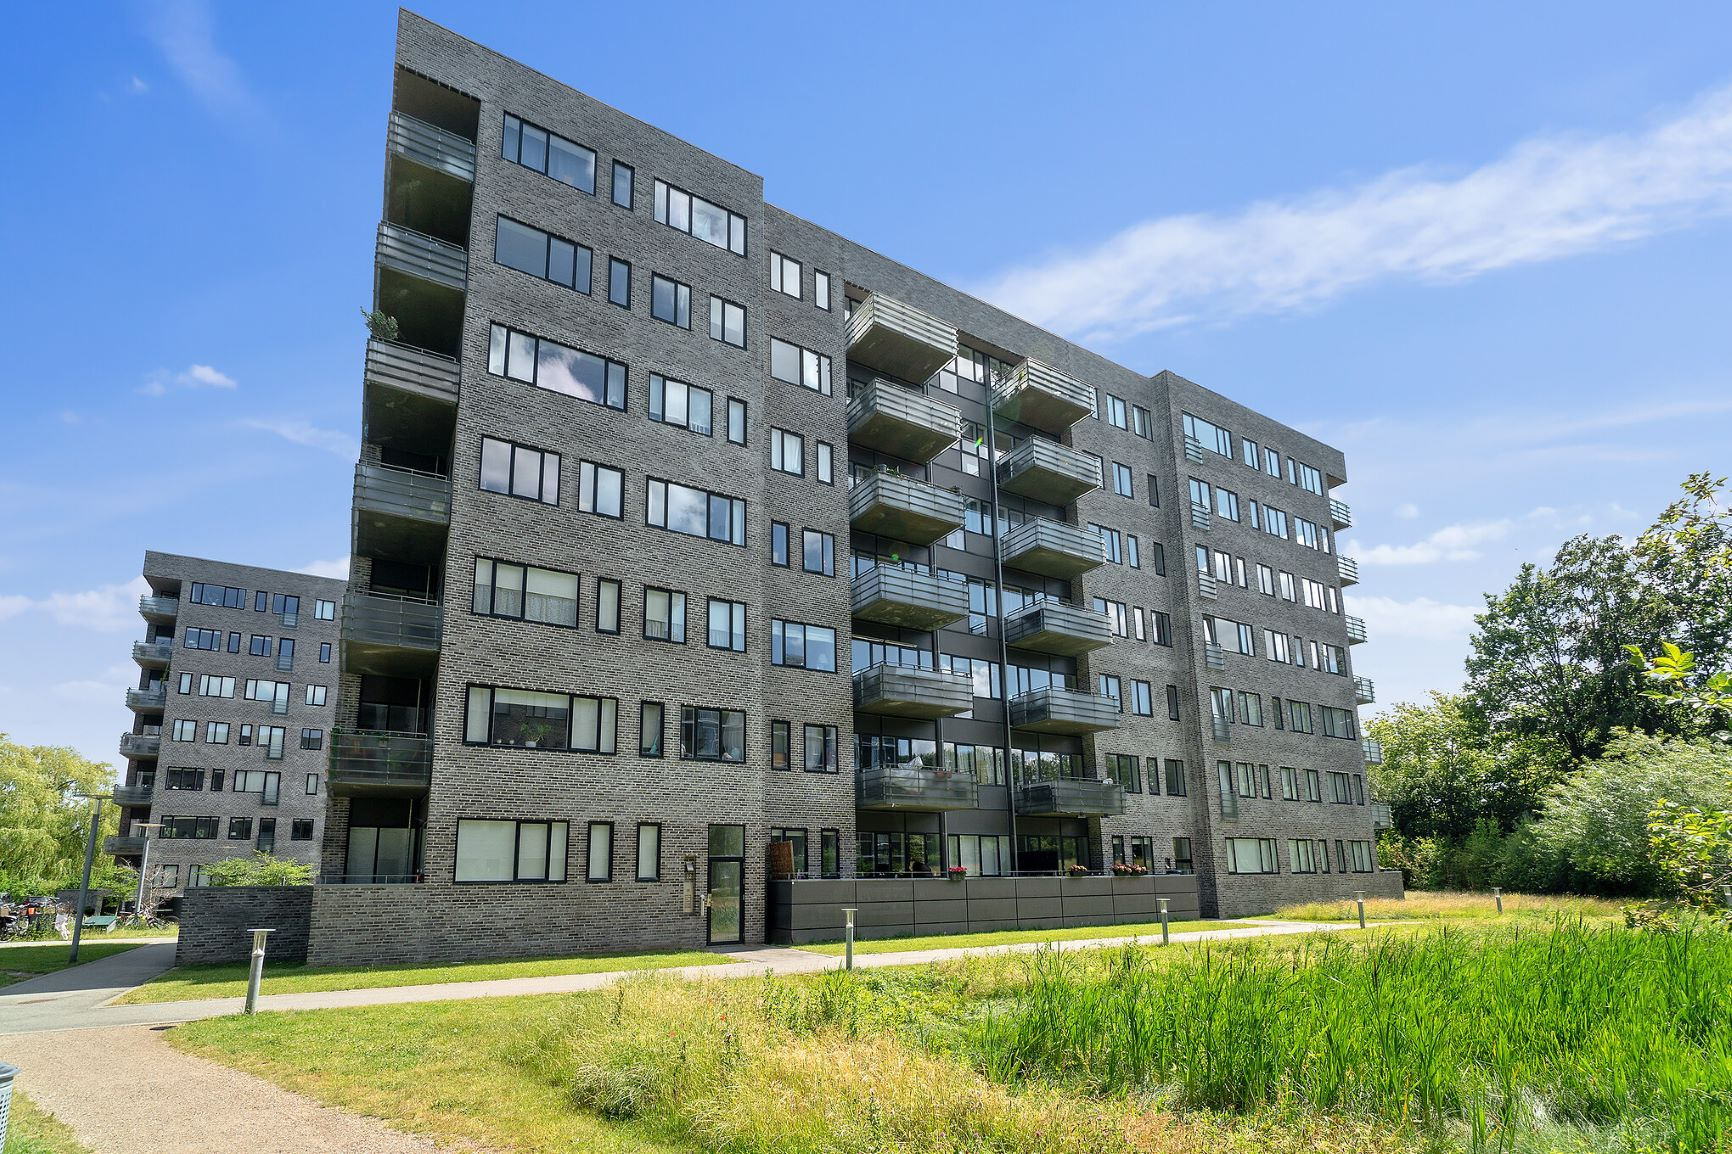 Lejebolig på Gyngemose Parkvej 22, 3. th., 2860 Søborg